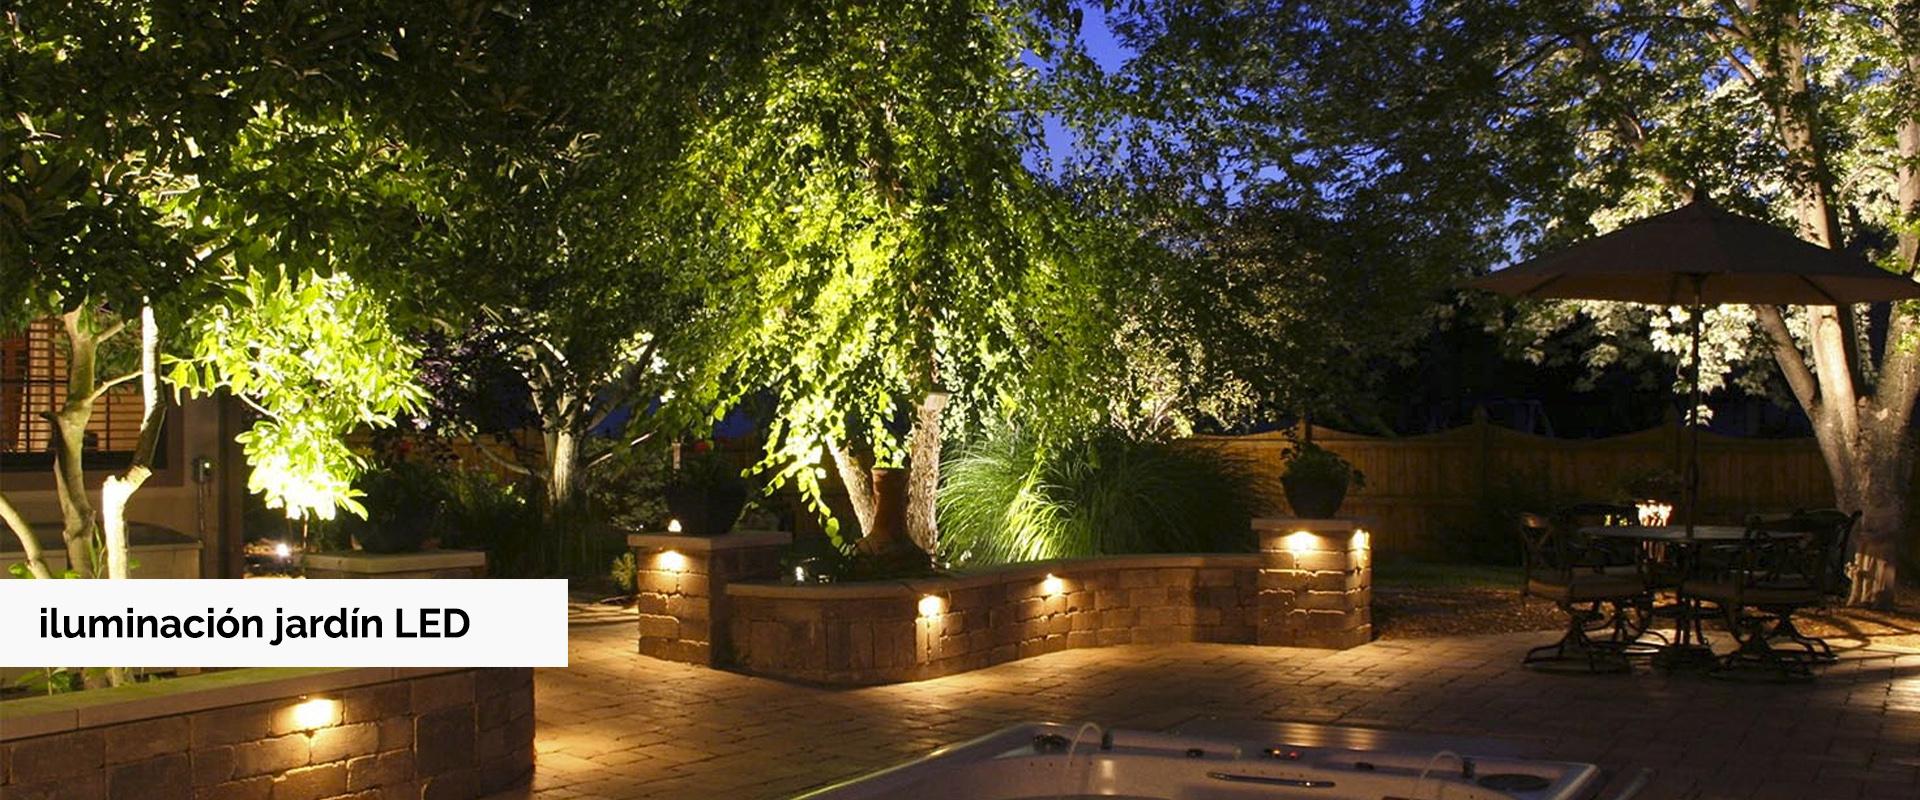 iluminacion-jardin-isolux.jpg